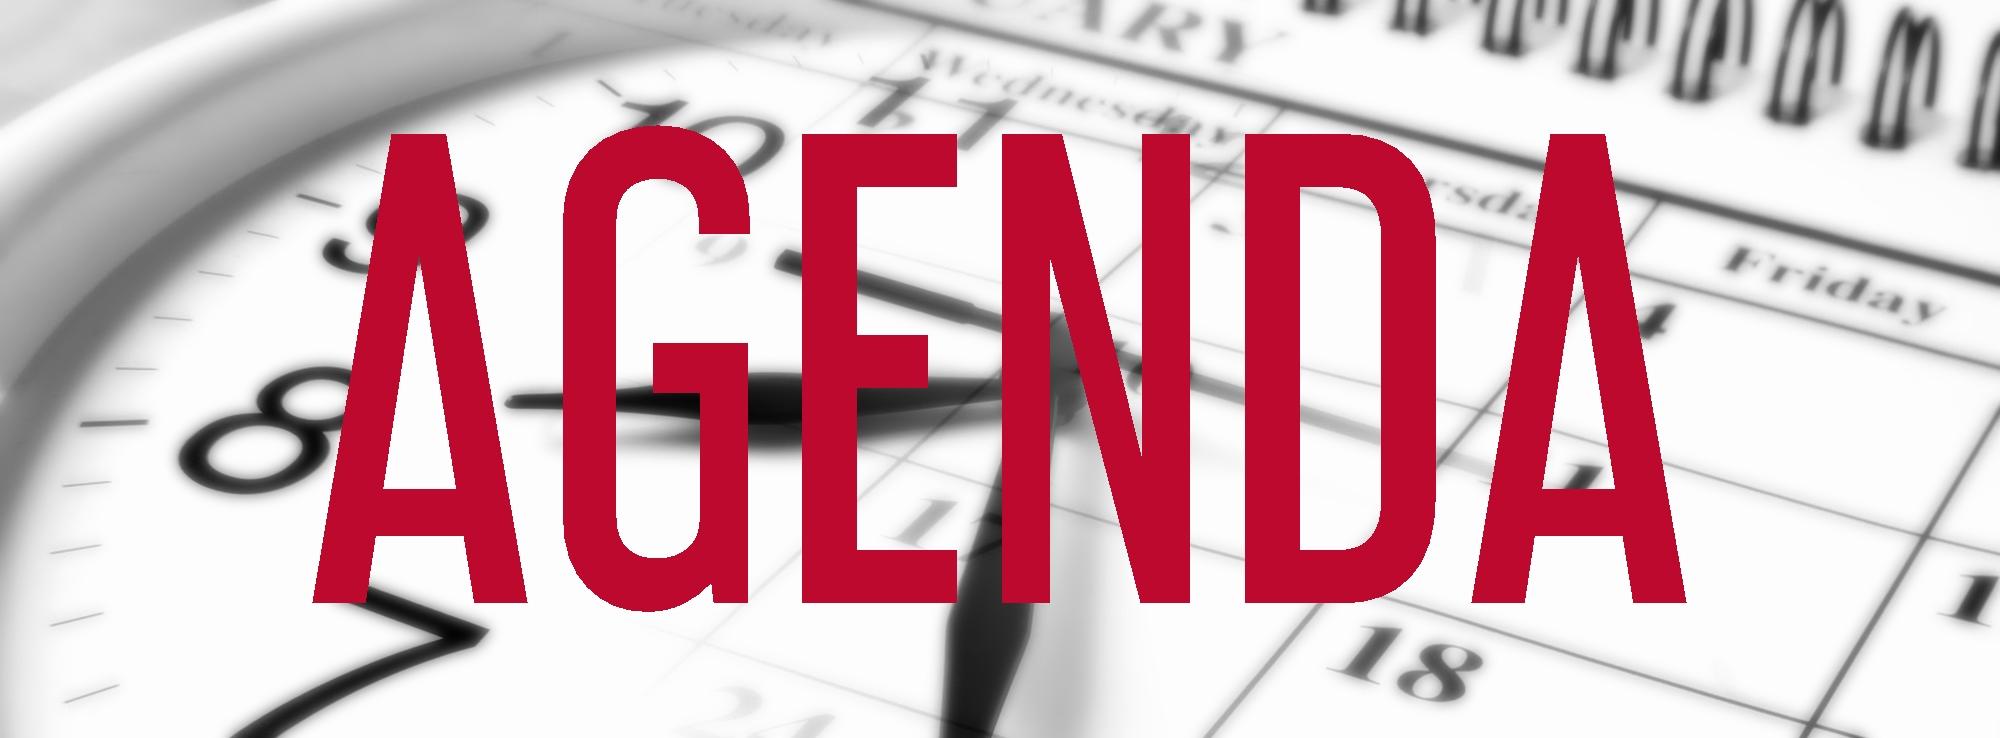 agenda_julien_leonardelli_frontnational